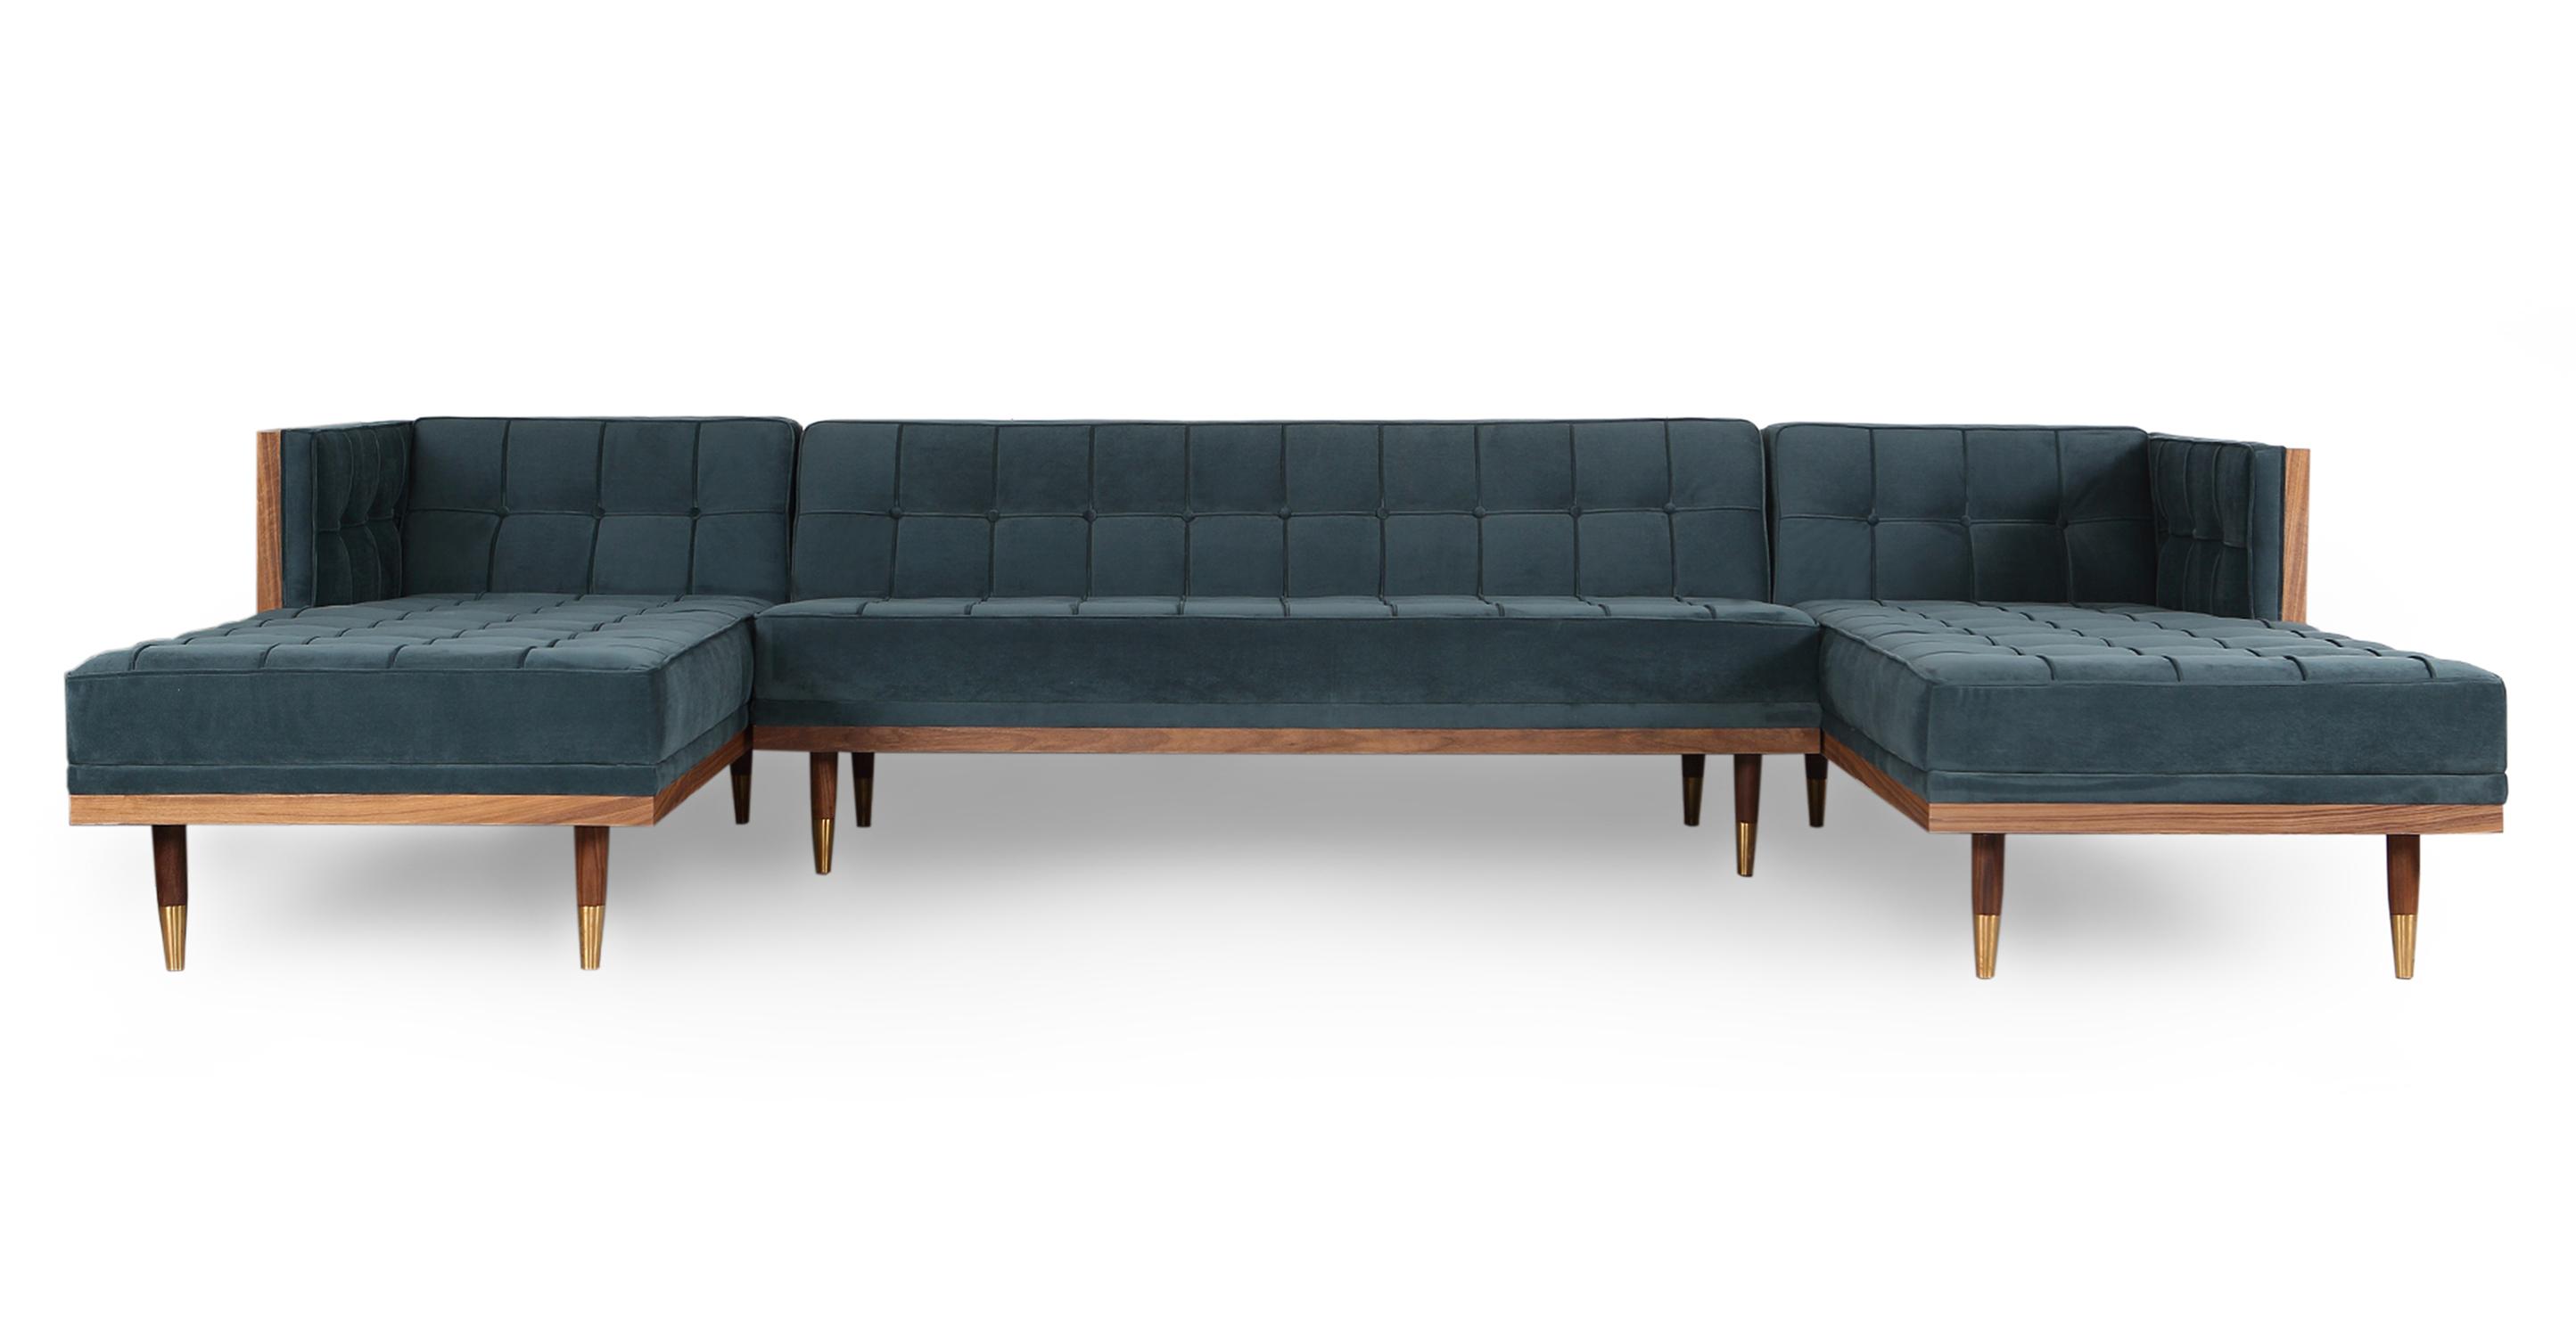 "Woodrow Box 126"" Sofa U-Sectional, Walnut/Neptune Velvet"